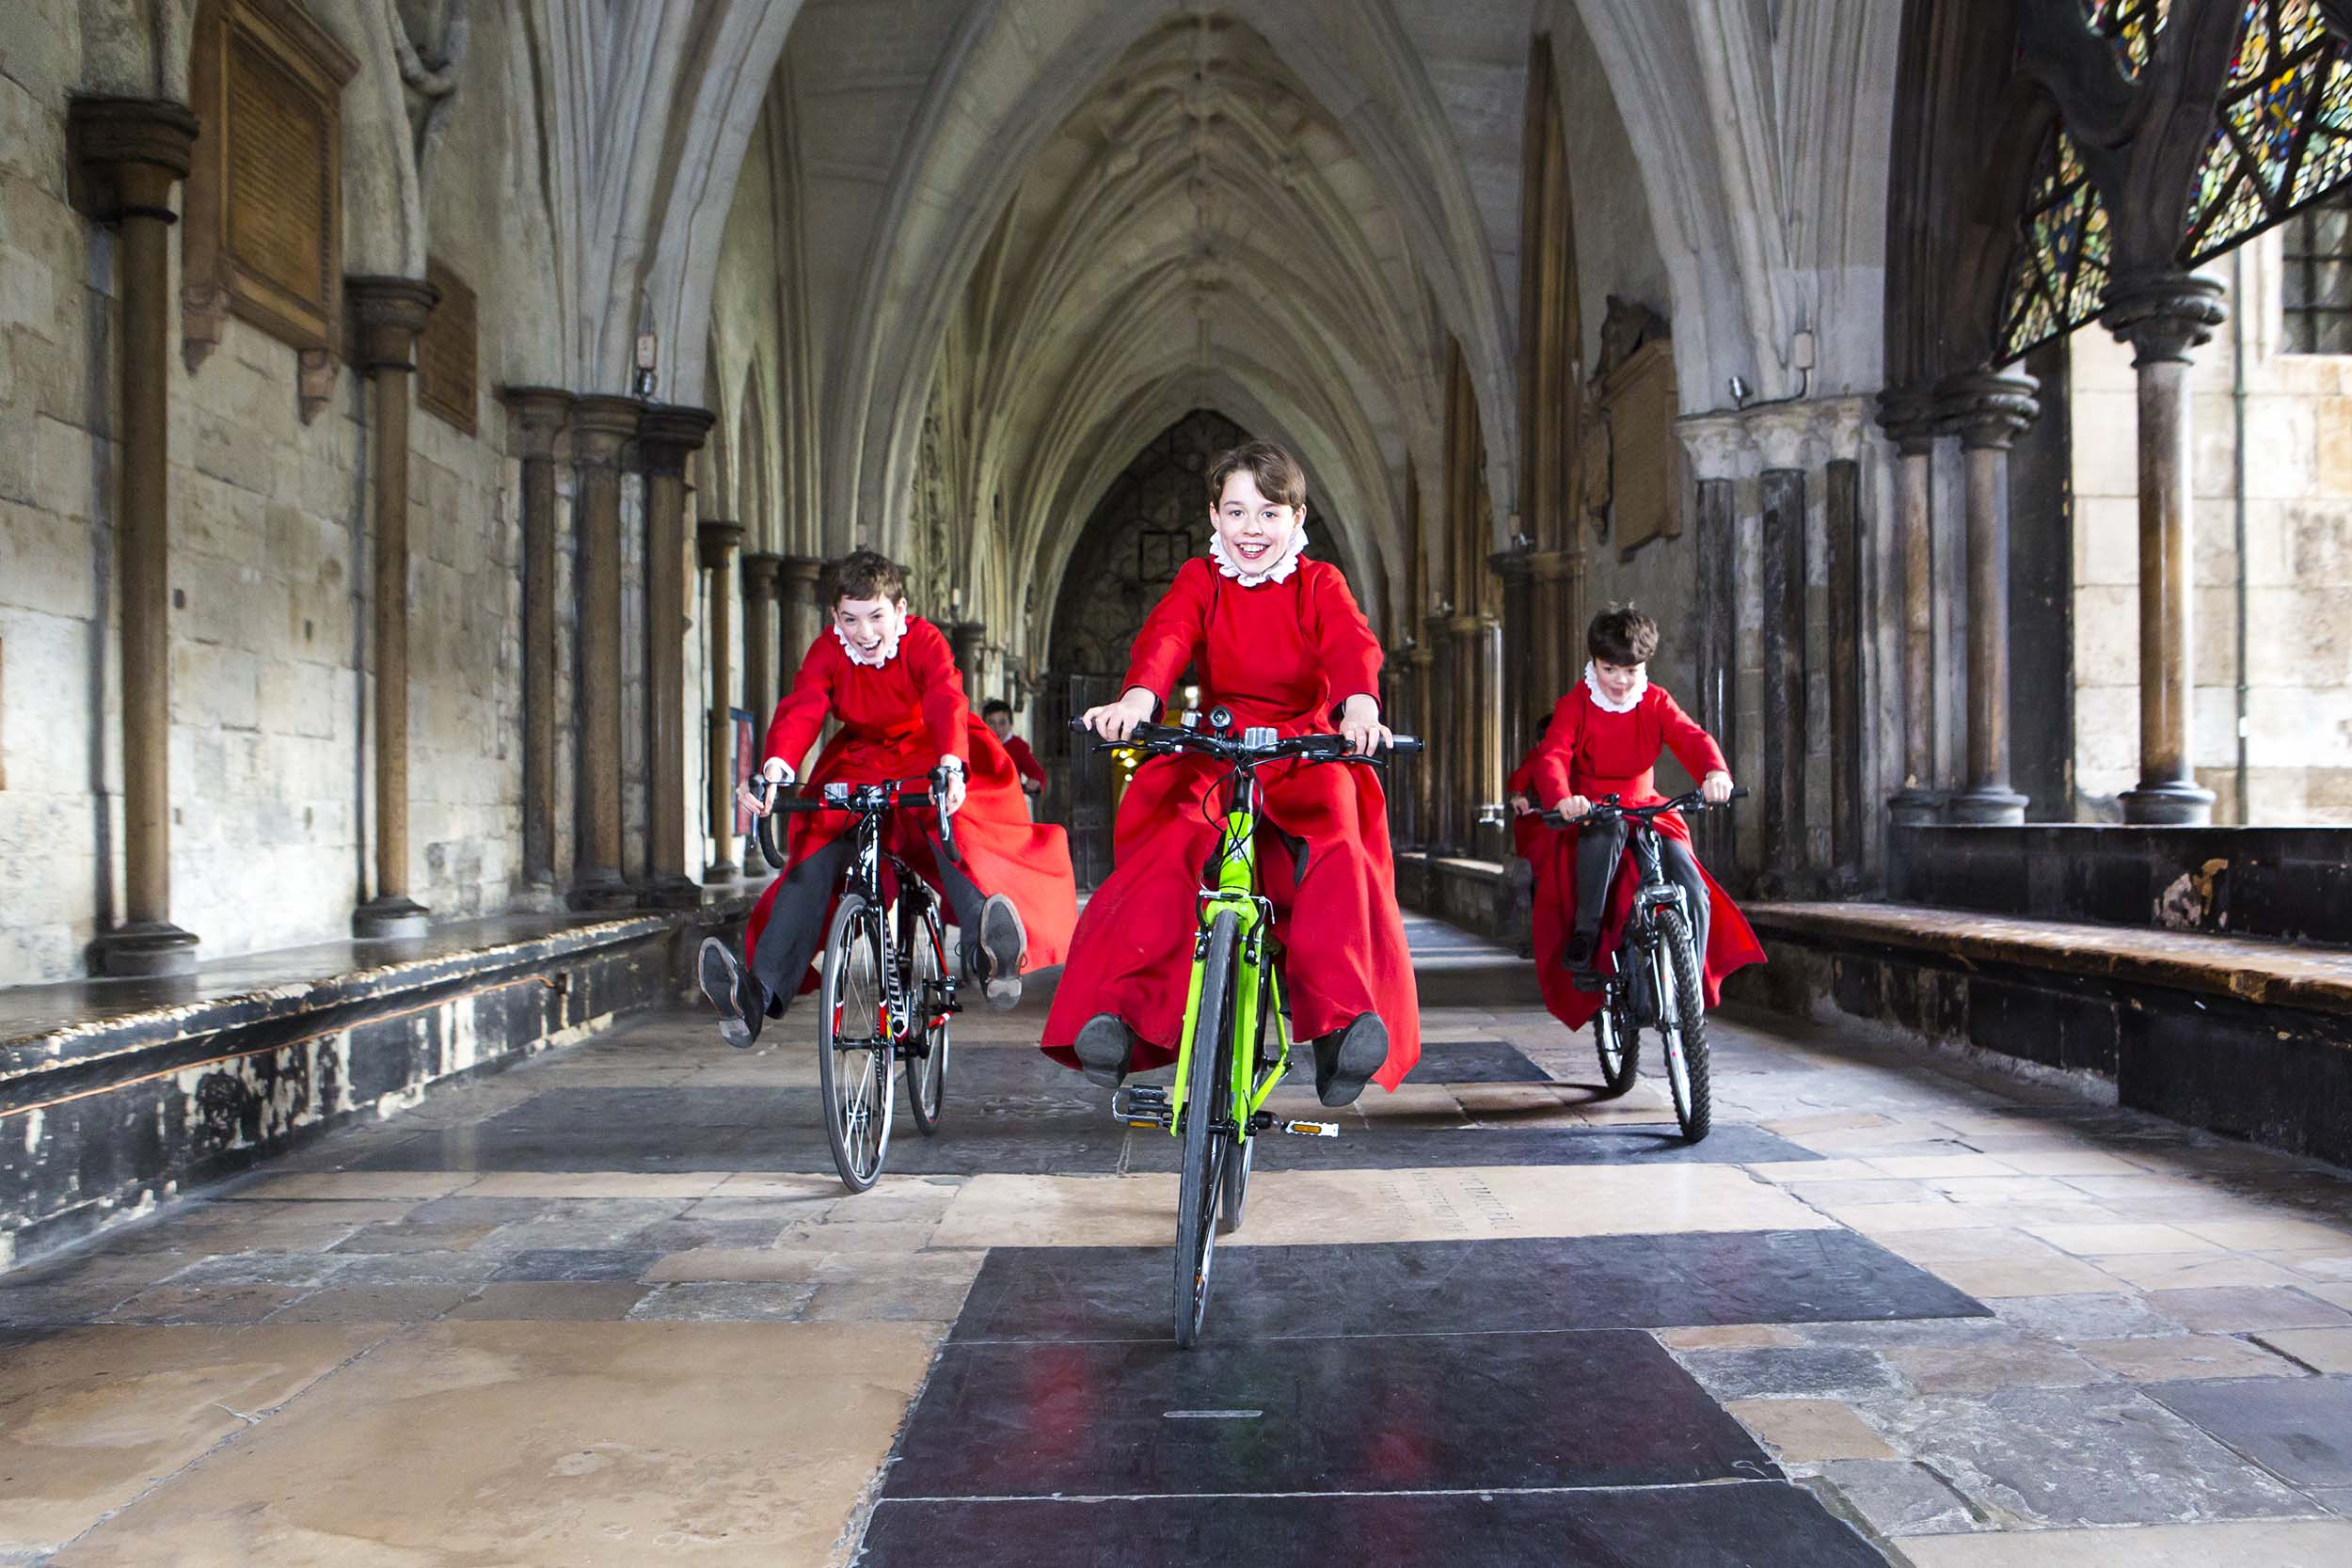 Choirboys-Bikes-SB_01